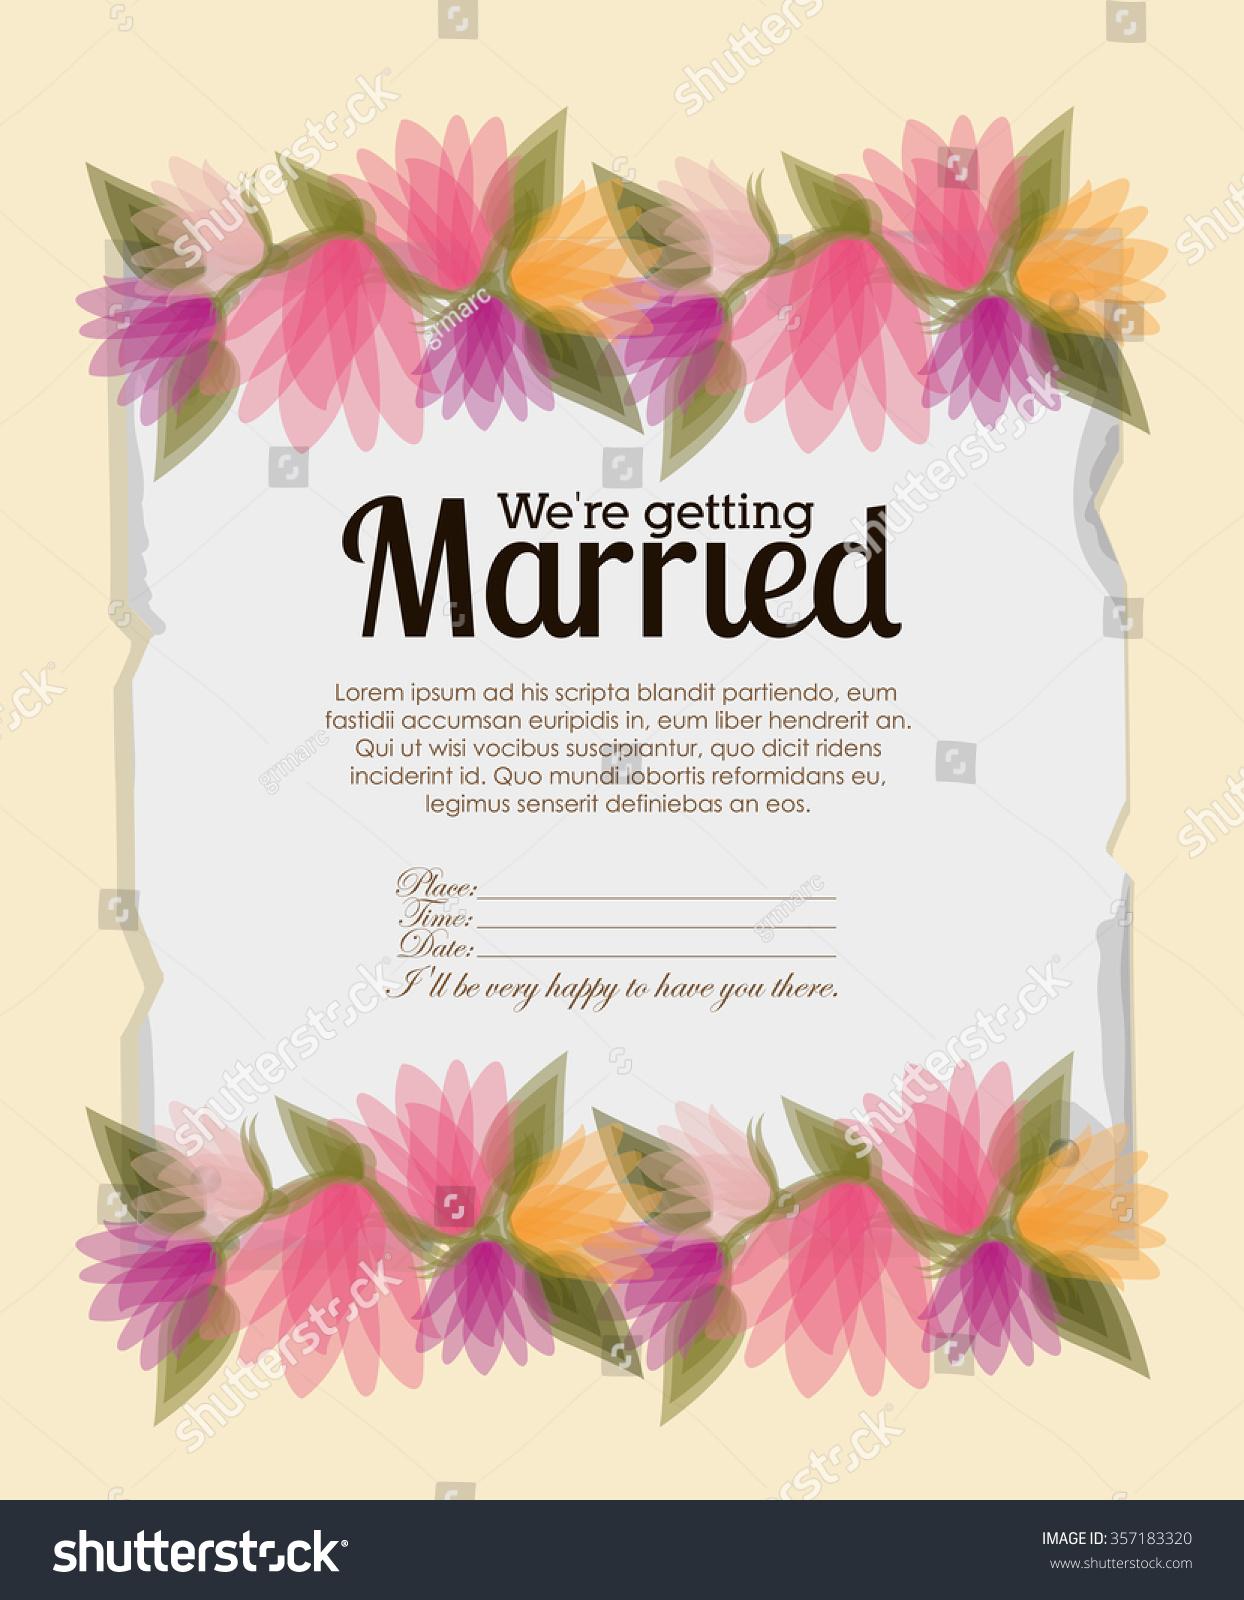 Wedding invitation design vector illustration eps10 stock vector wedding invitation design vector illustration eps10 graphic stopboris Gallery